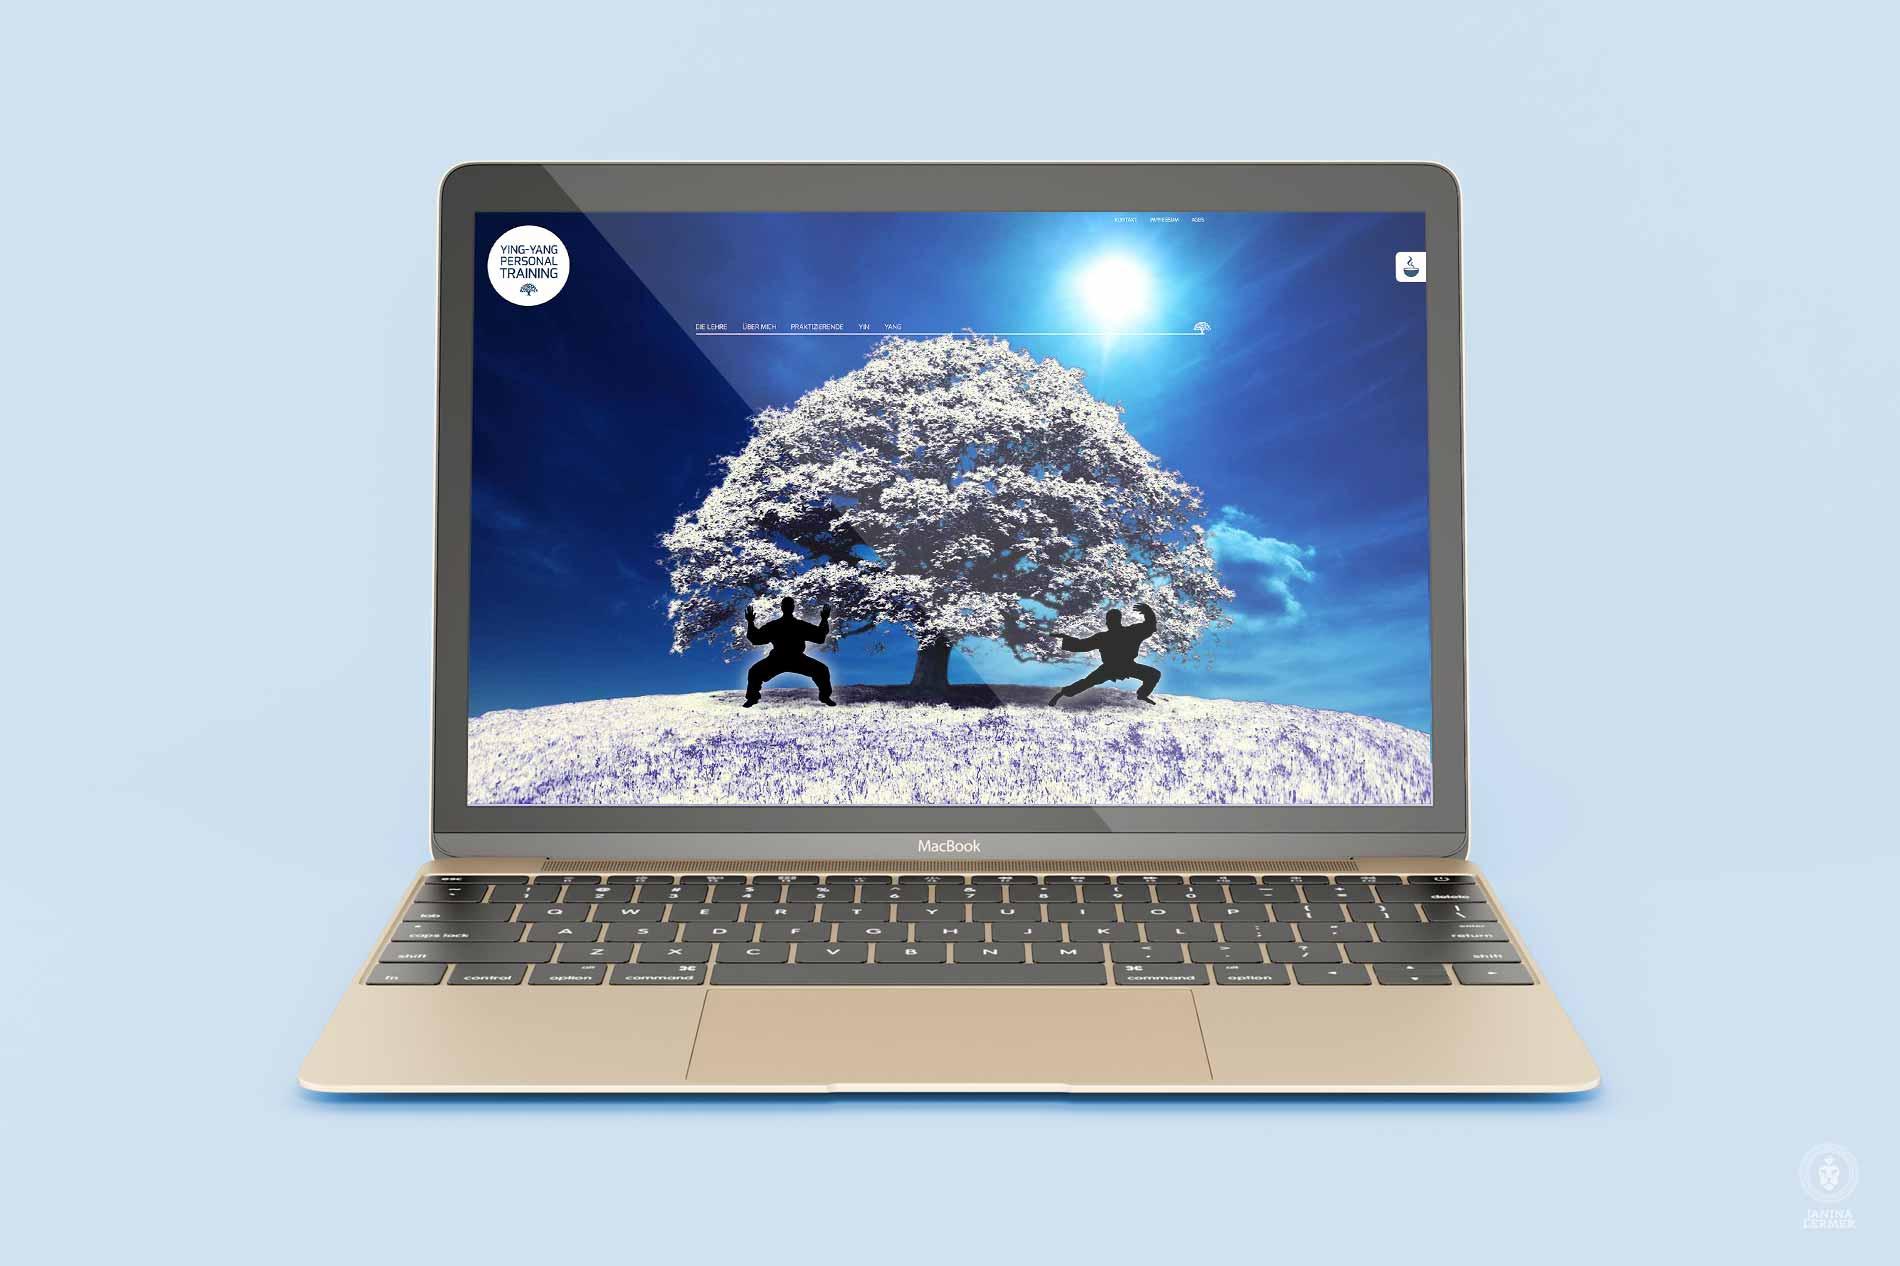 Webseitenkonzept-Webseitengestaltung-Webdesign-Yin-Yang-PersonalTrainer-Ulrich-Lampert-Laptop-Winter